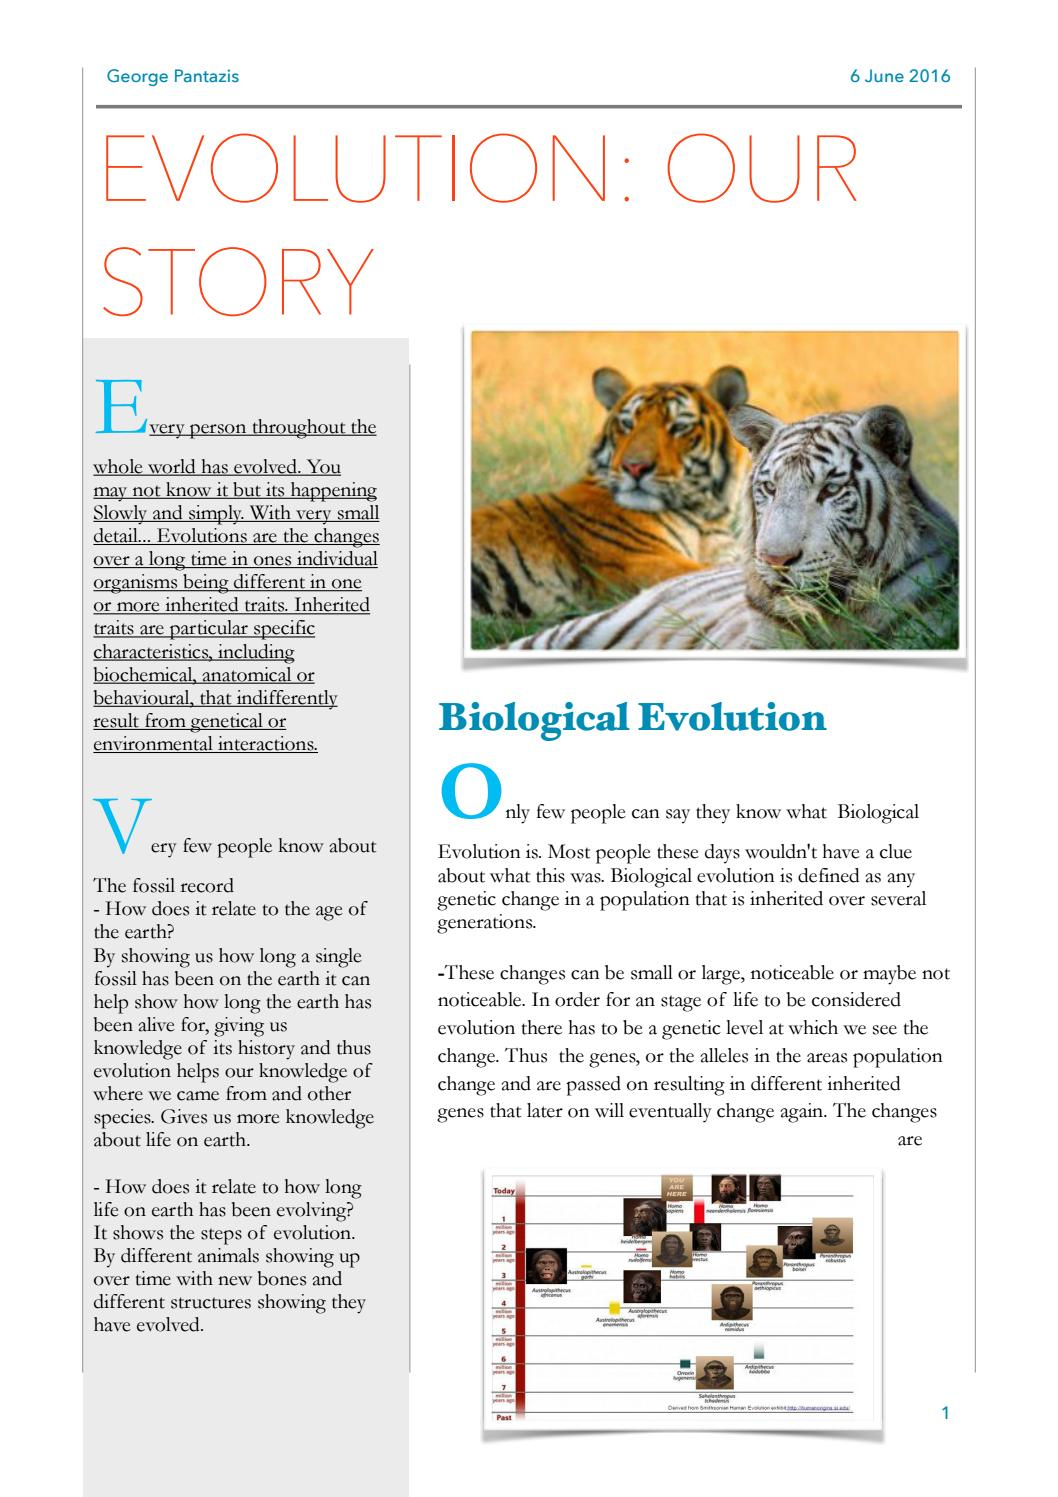 004 - Evidence for Evolution